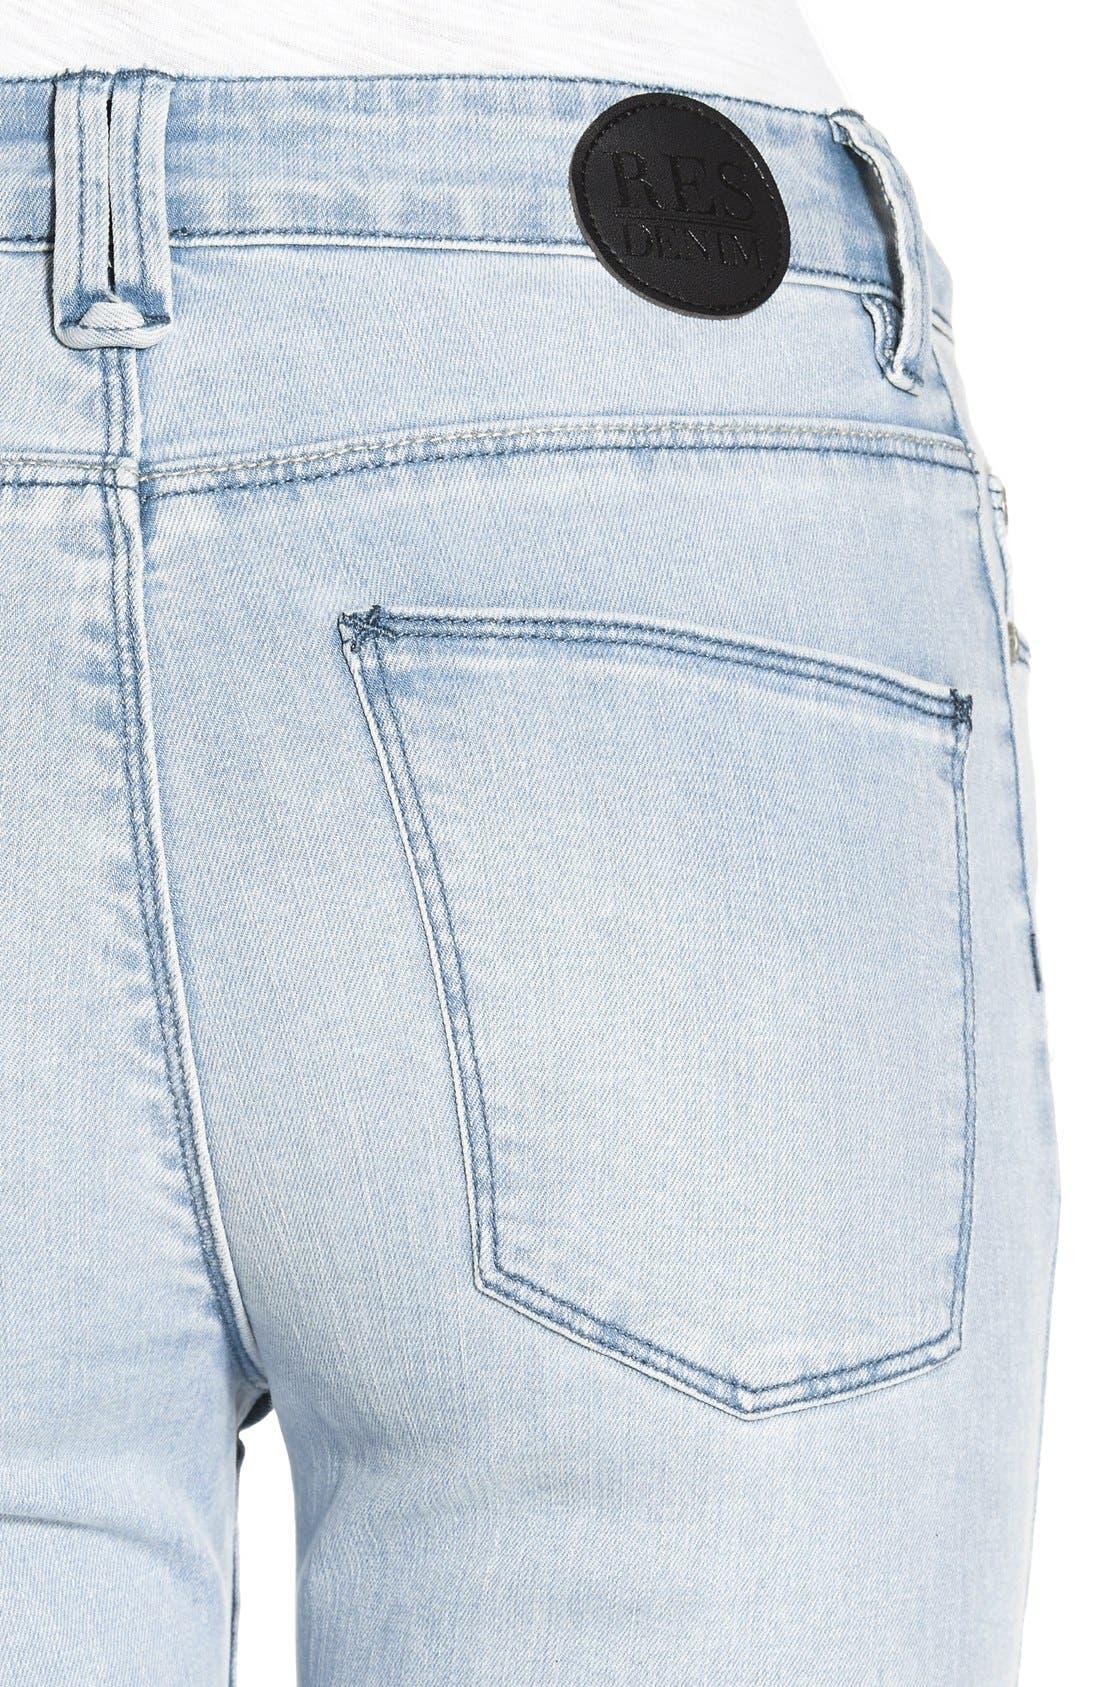 Alternate Image 4  - RES Denim 'Kitty' Skinny Jeans (Love Moves Destroyer)